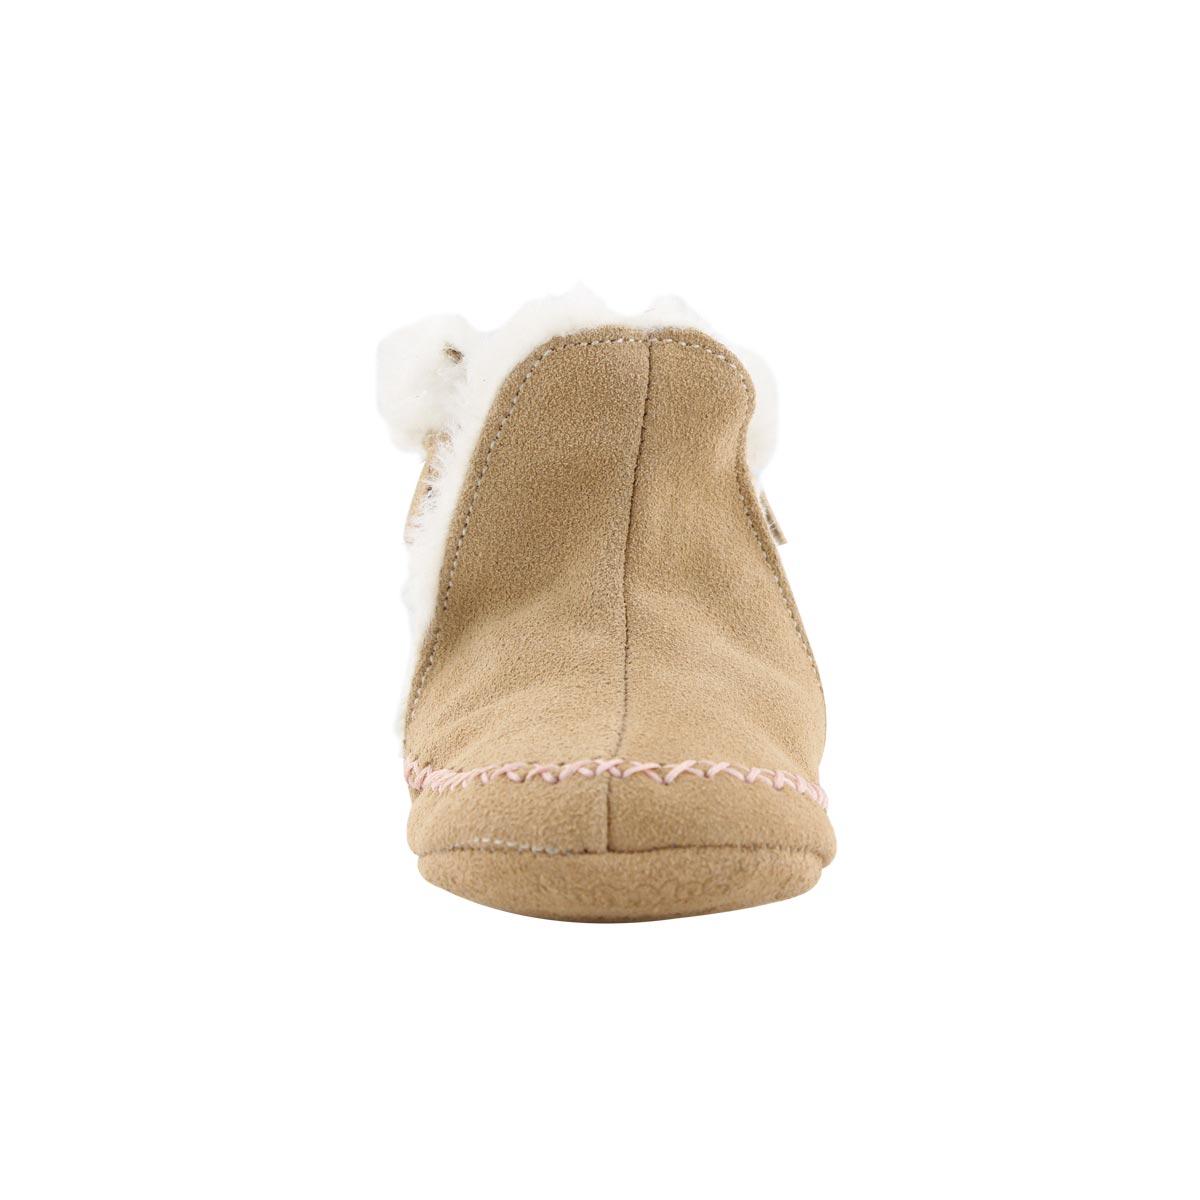 Infs-g Smocassin tan/pink slipper bootie